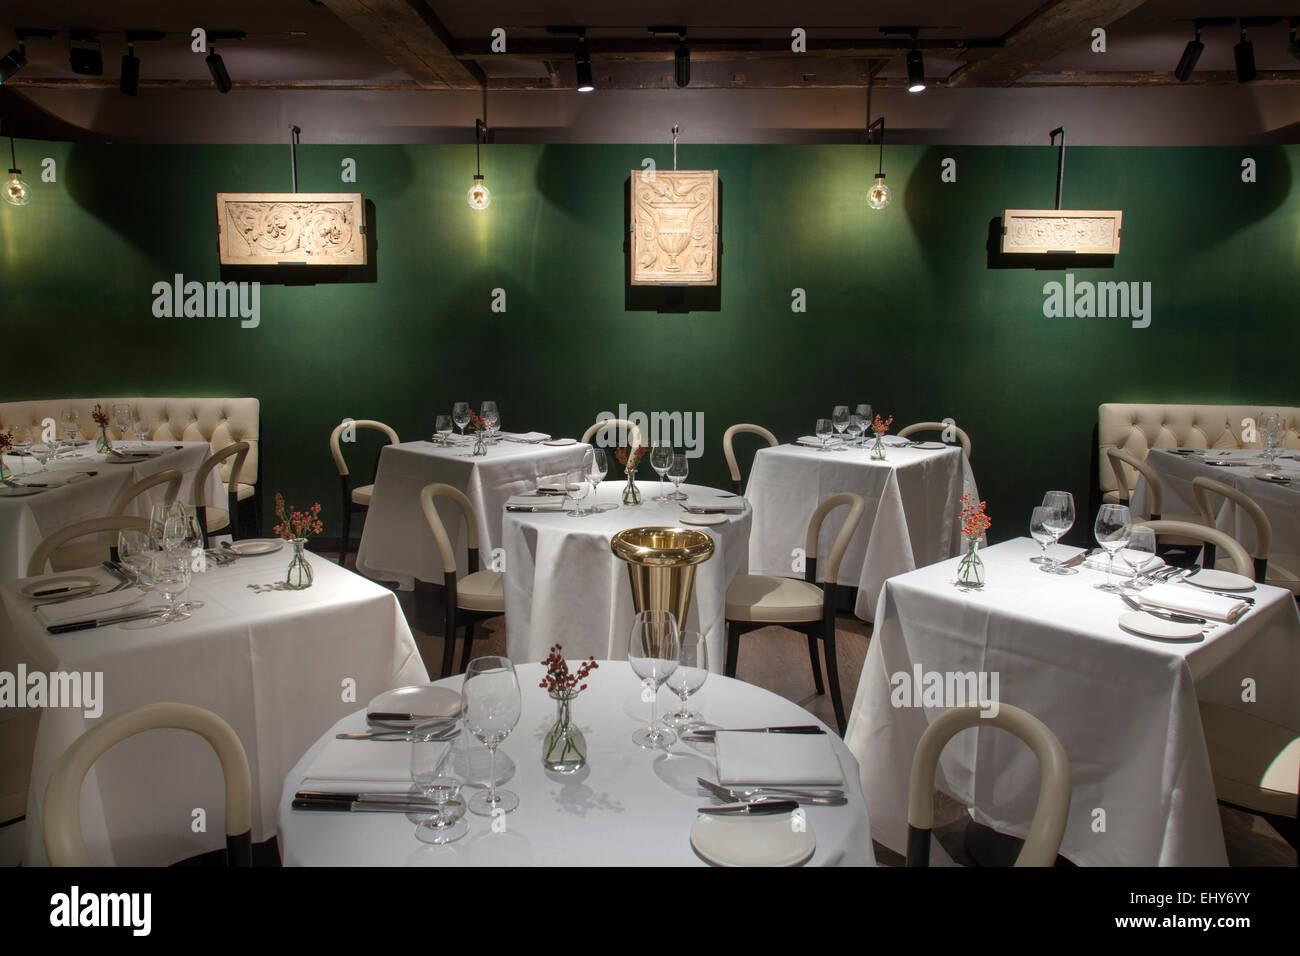 members dining room stock photos & members dining room stock